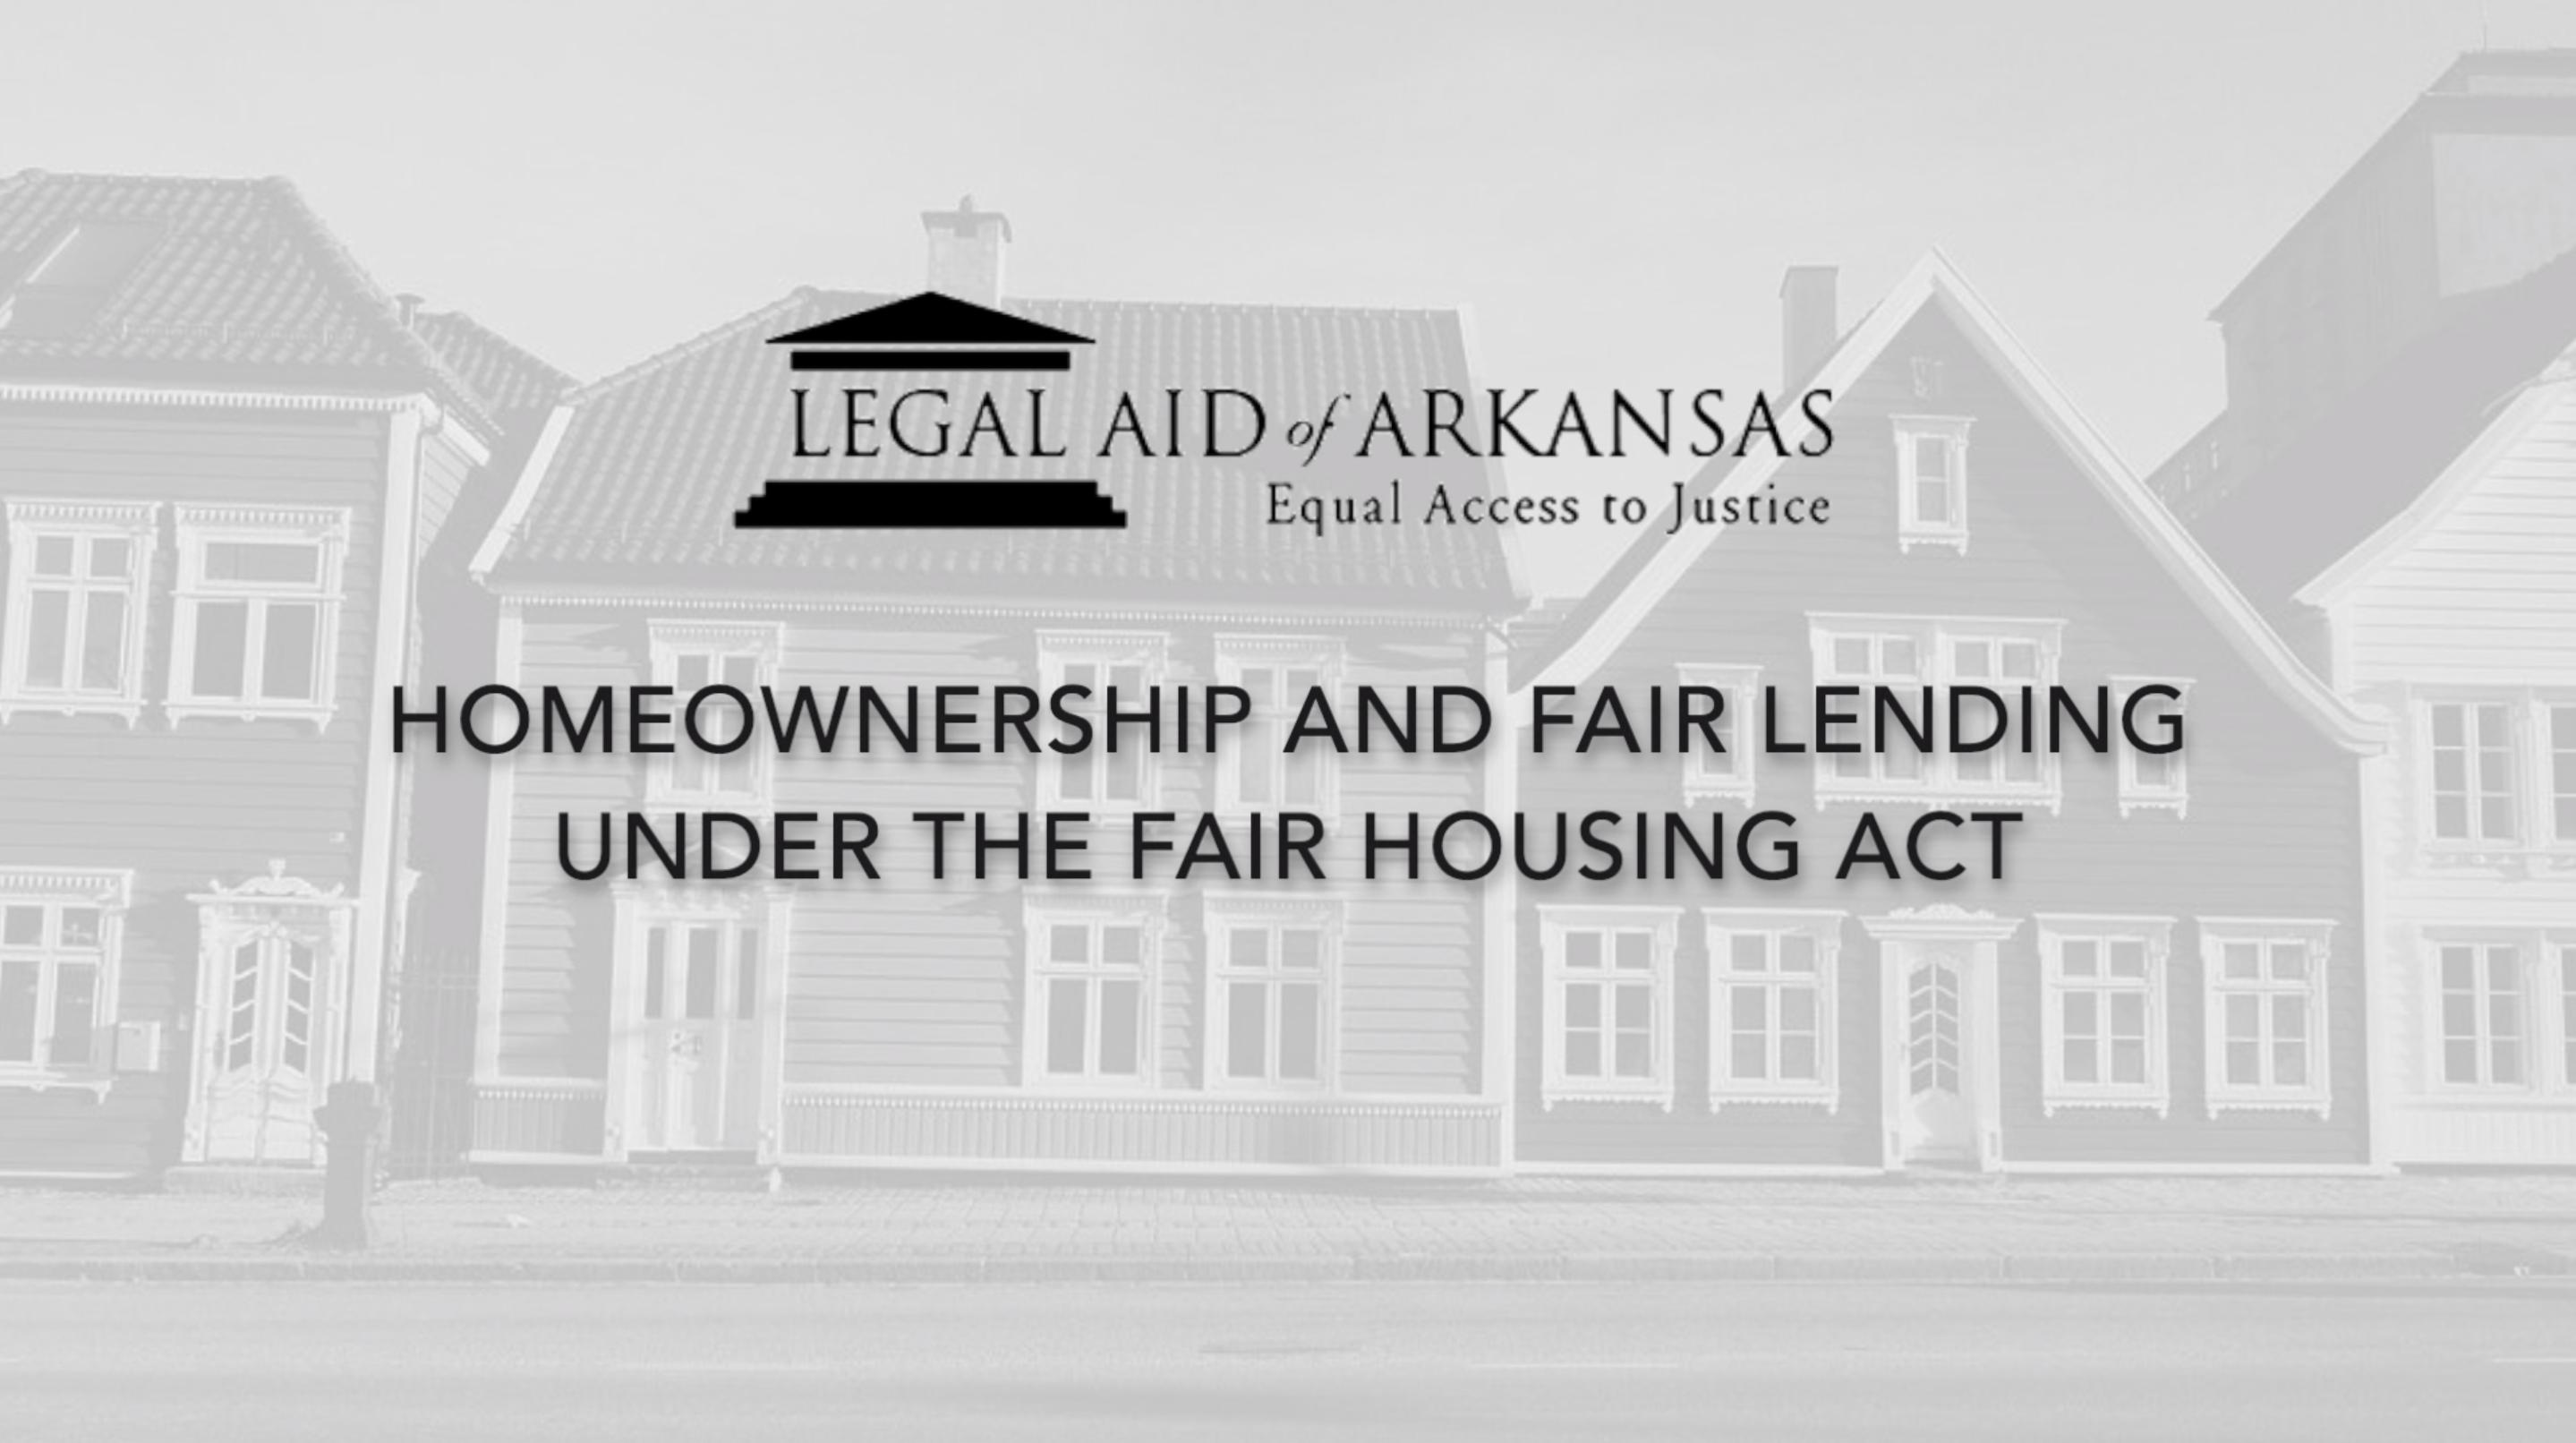 VIDEO - Homeownership and Fair Lending Under the Fair Housing Act